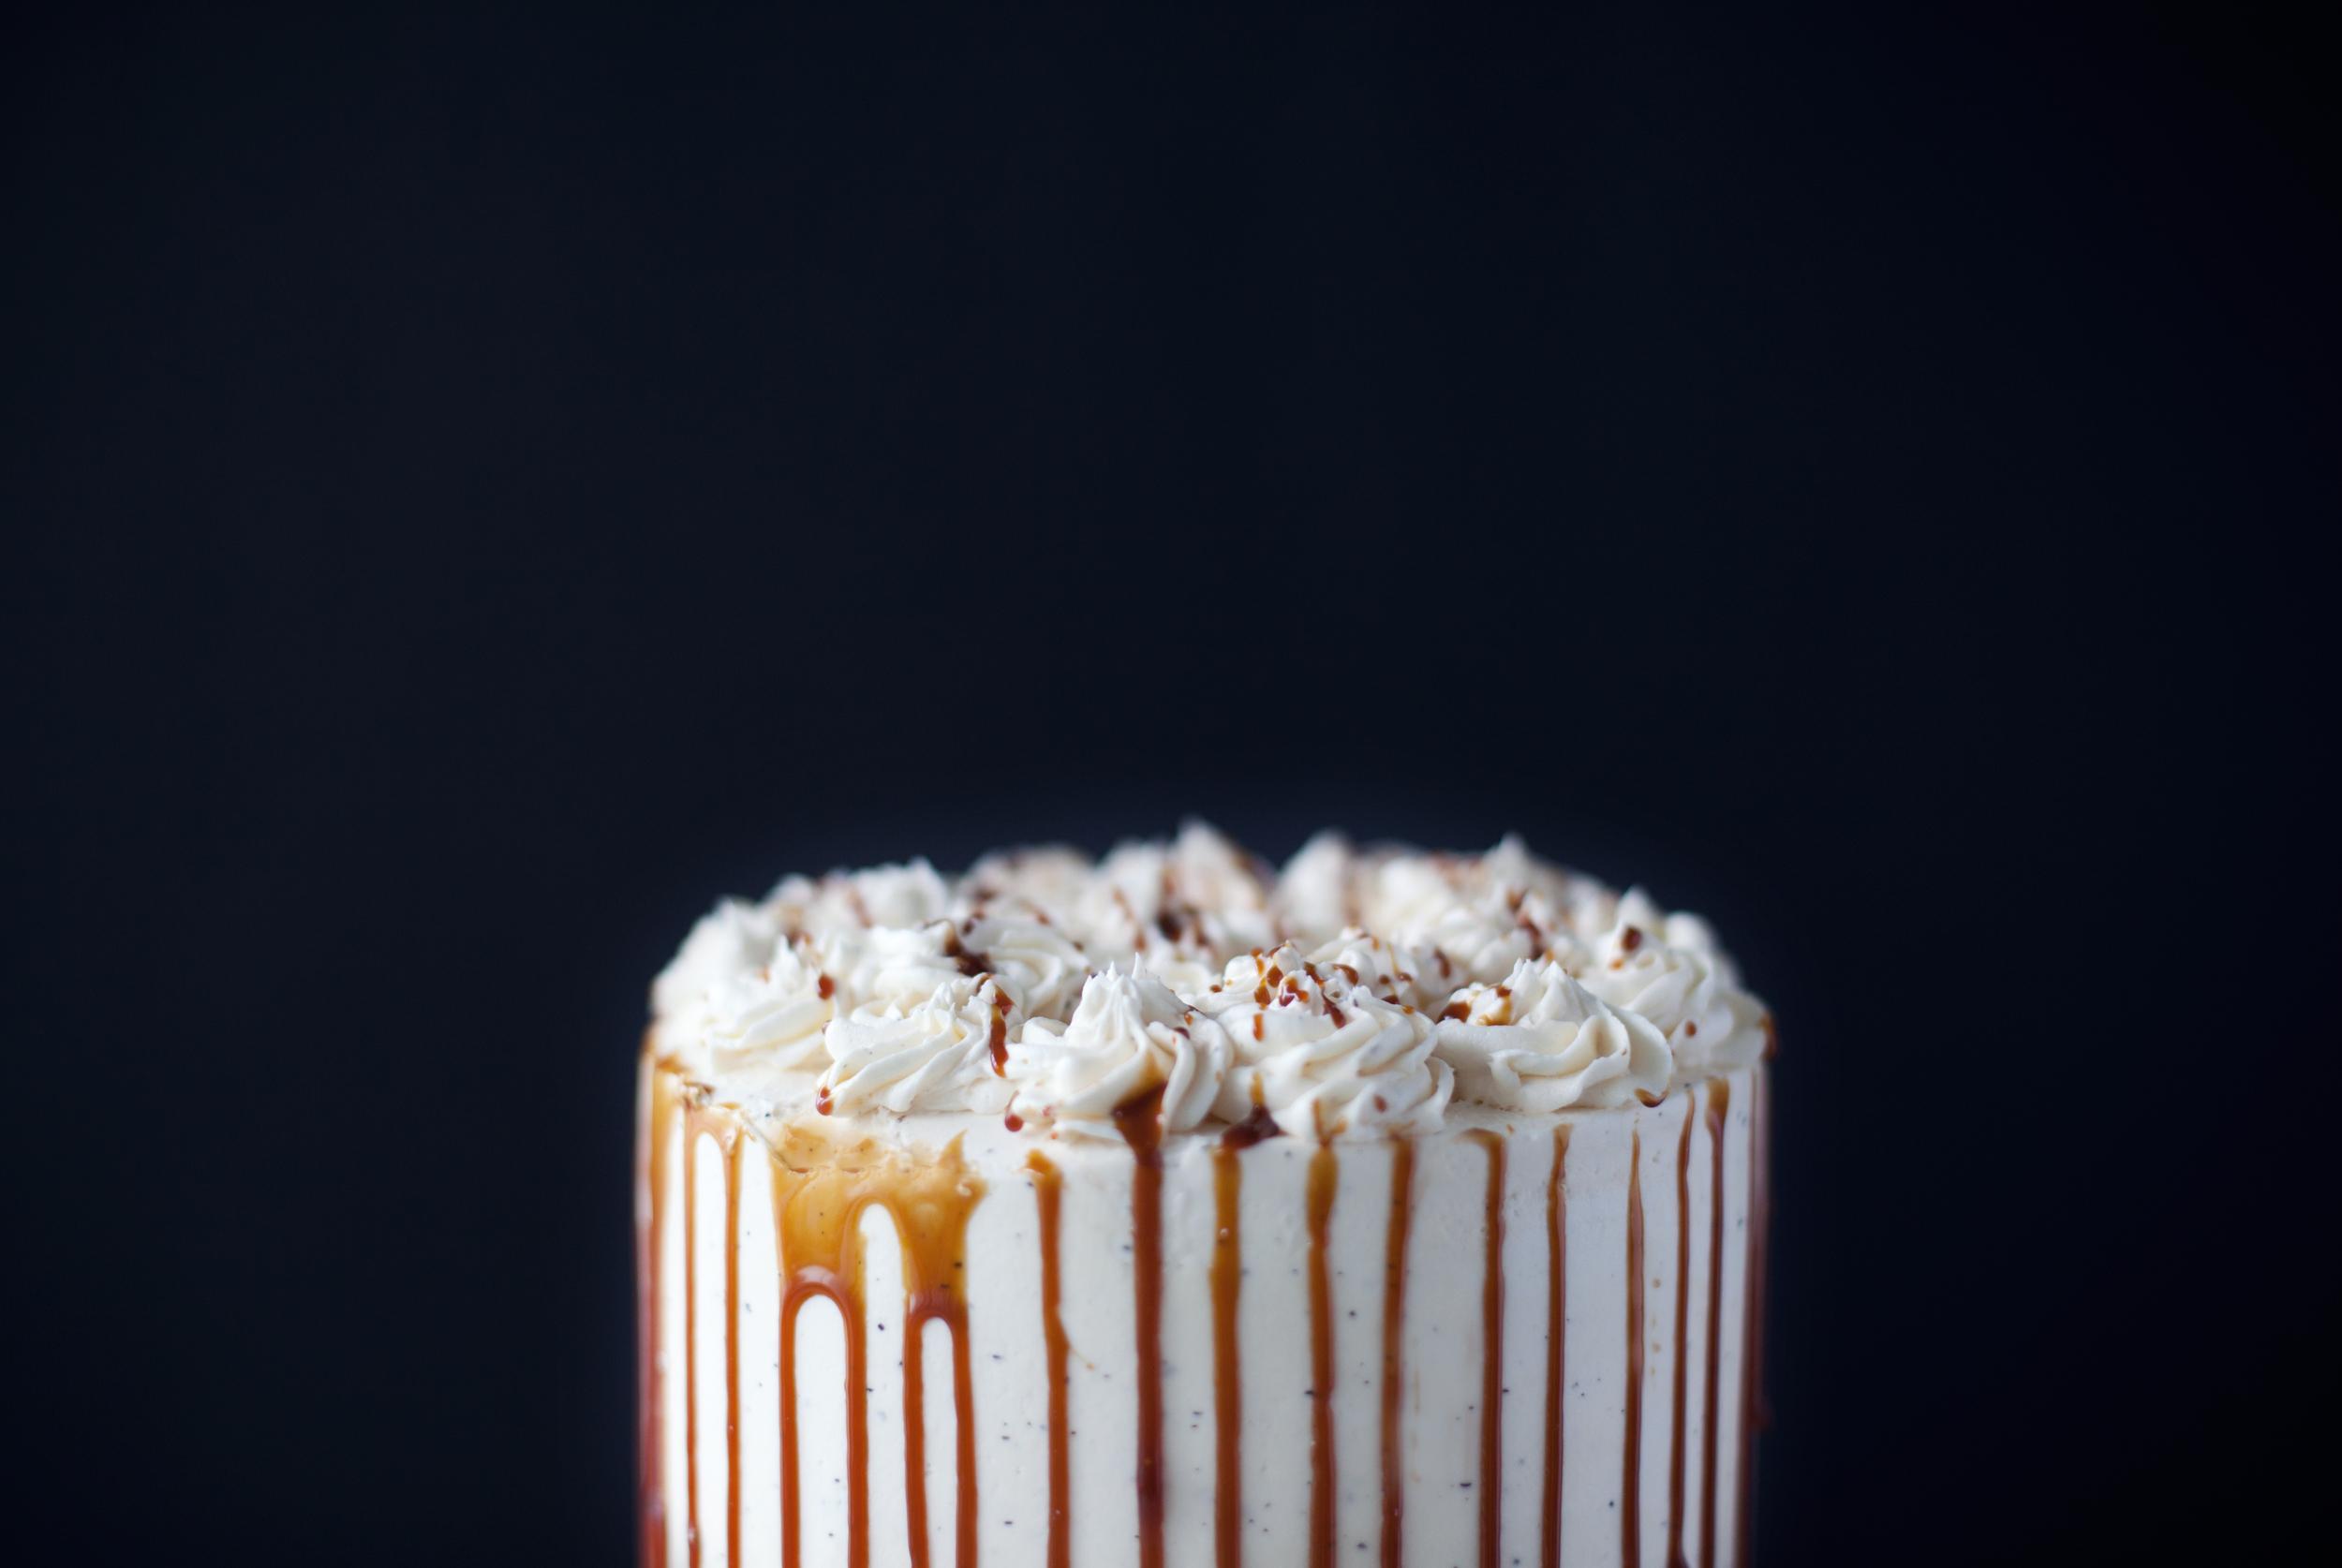 london fog cake i.jpg